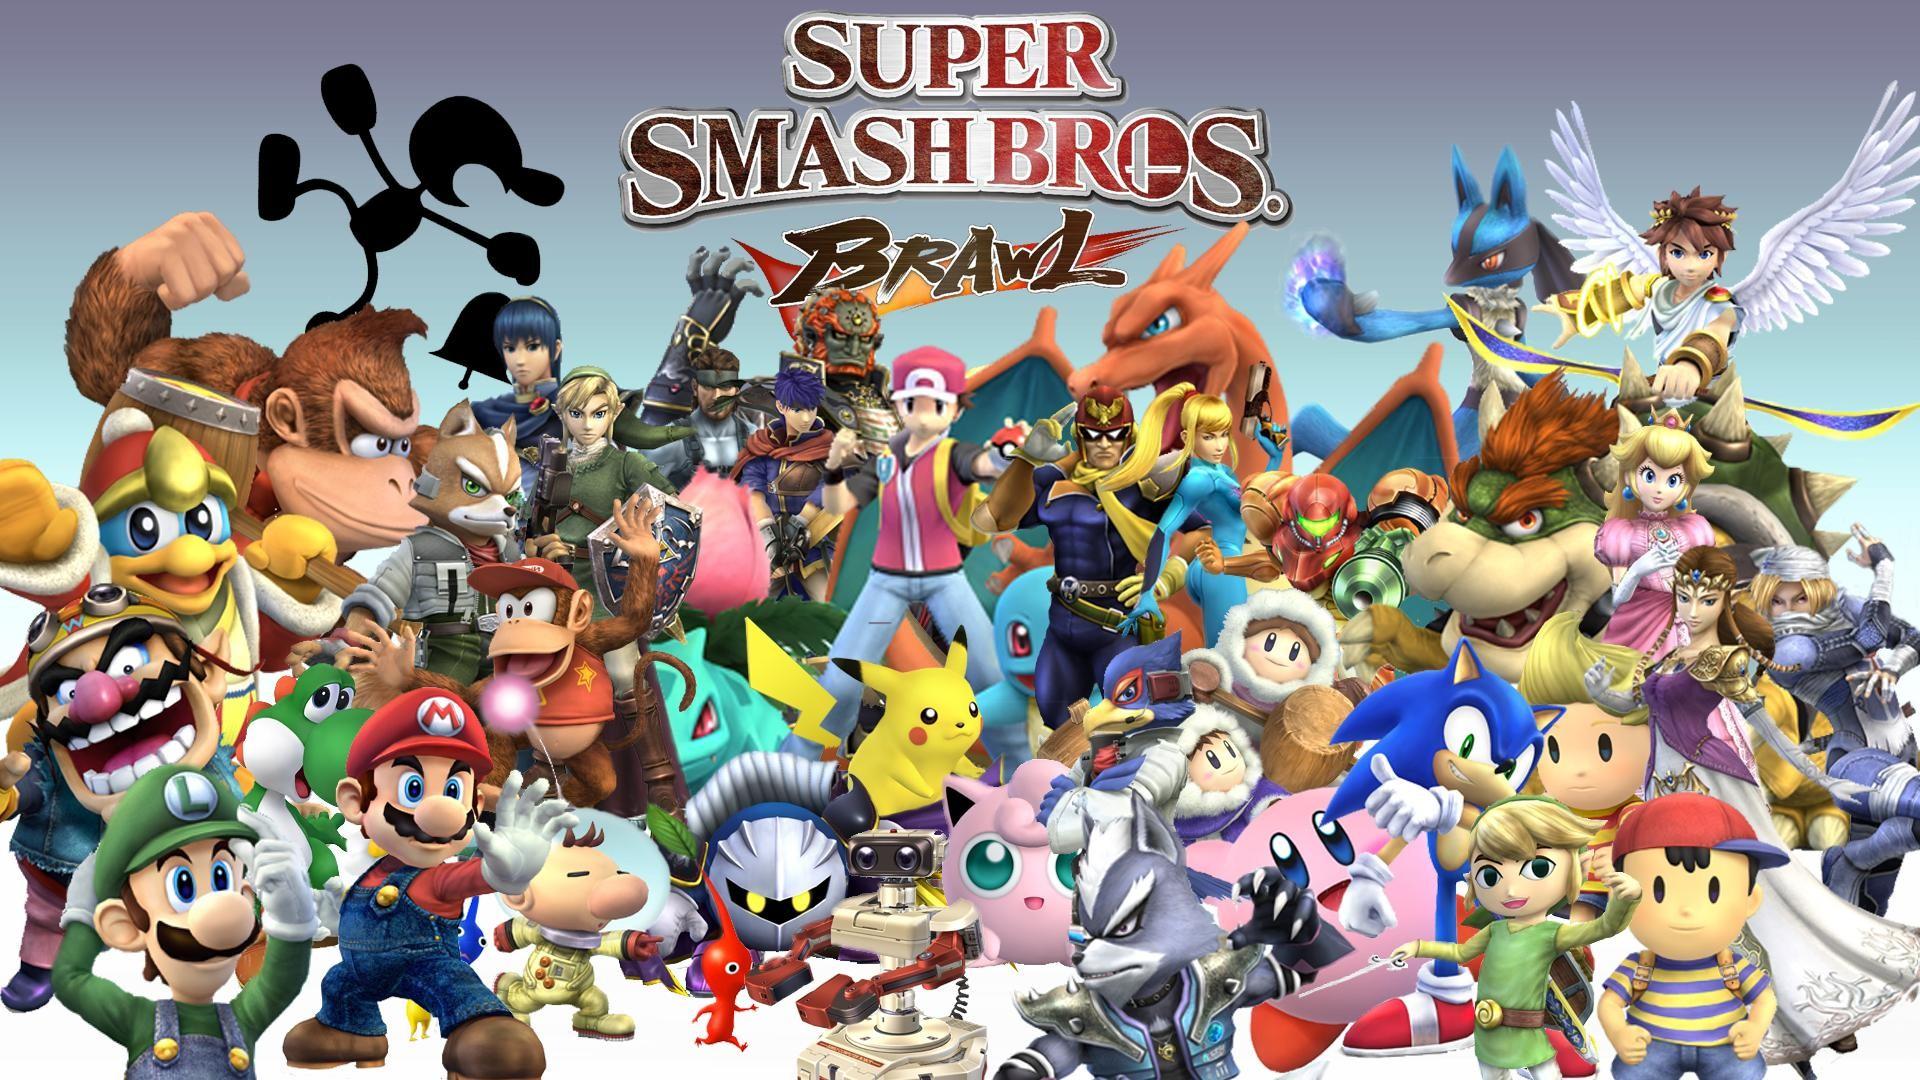 Super Smash Bros Melee Wallpaper